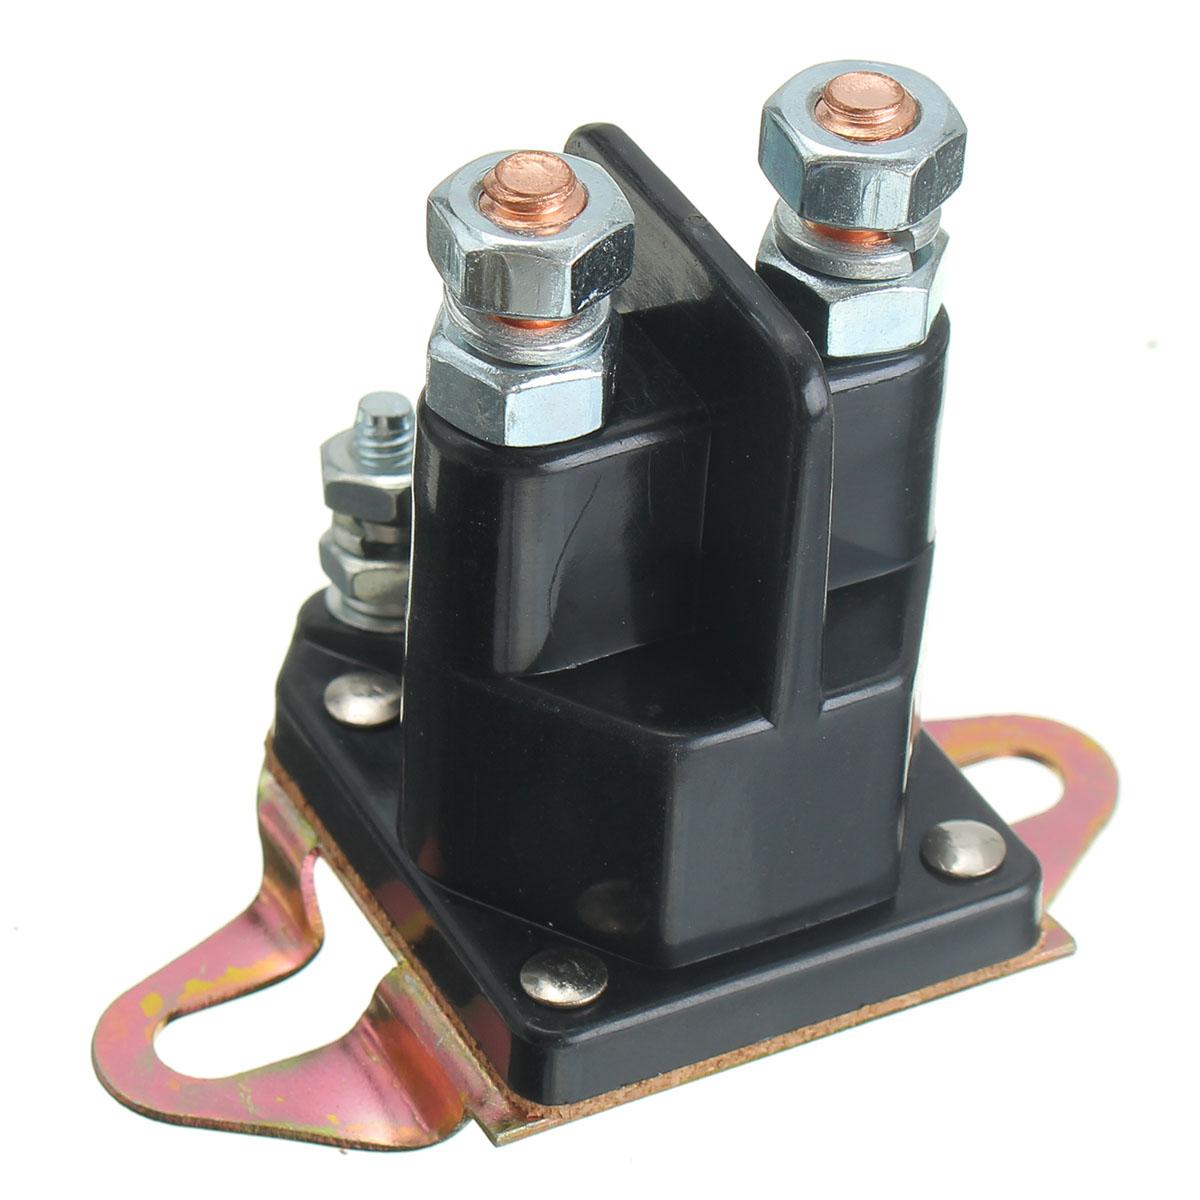 12v starter solenoid relay contactor switch engine for briggs Starter Briggs 12 e5fb1815 b467 461a b5c9 8714e3eafdb0